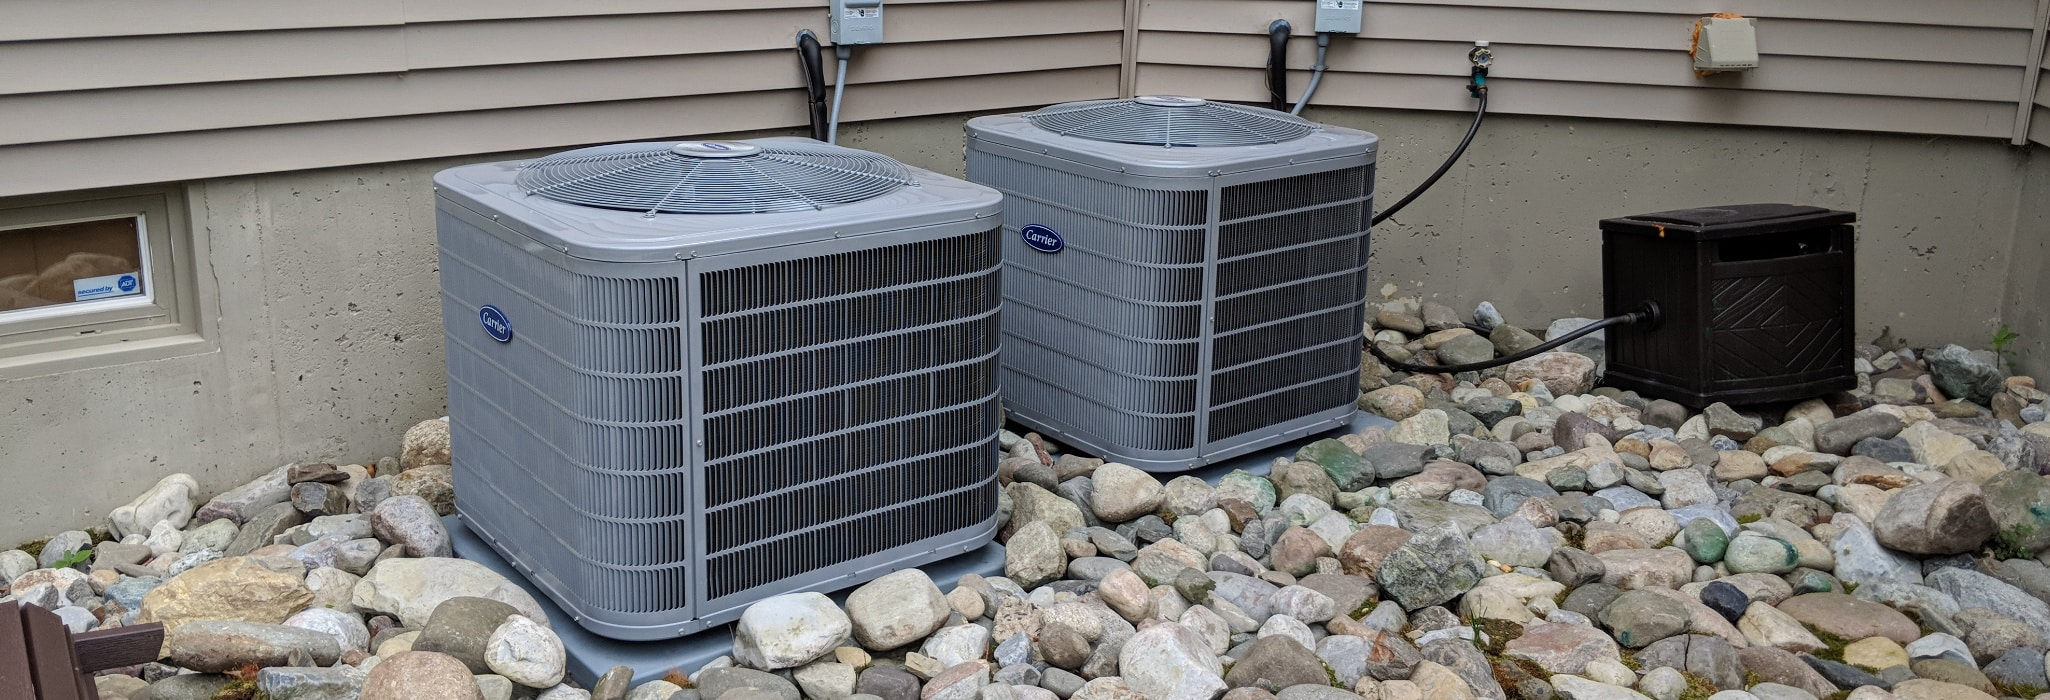 heat pump installation replacement